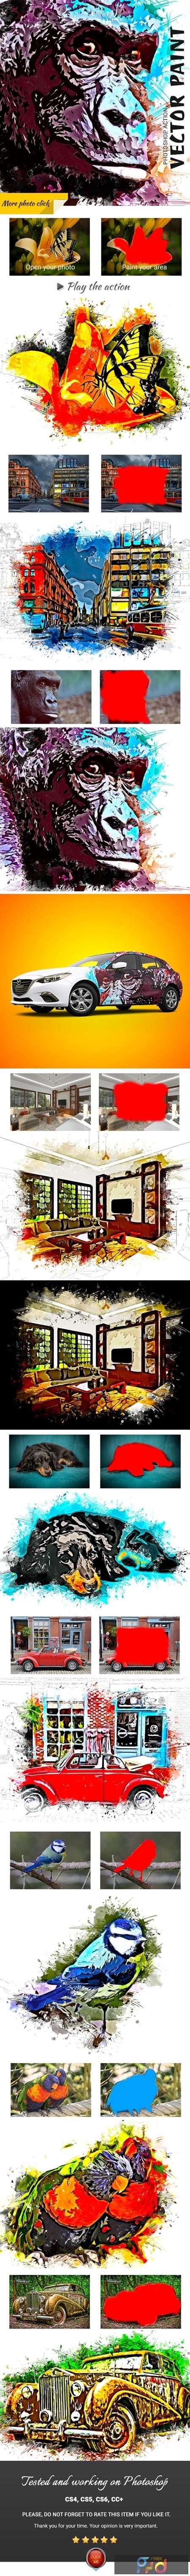 Vector Paint Photoshop Action 24755197 1